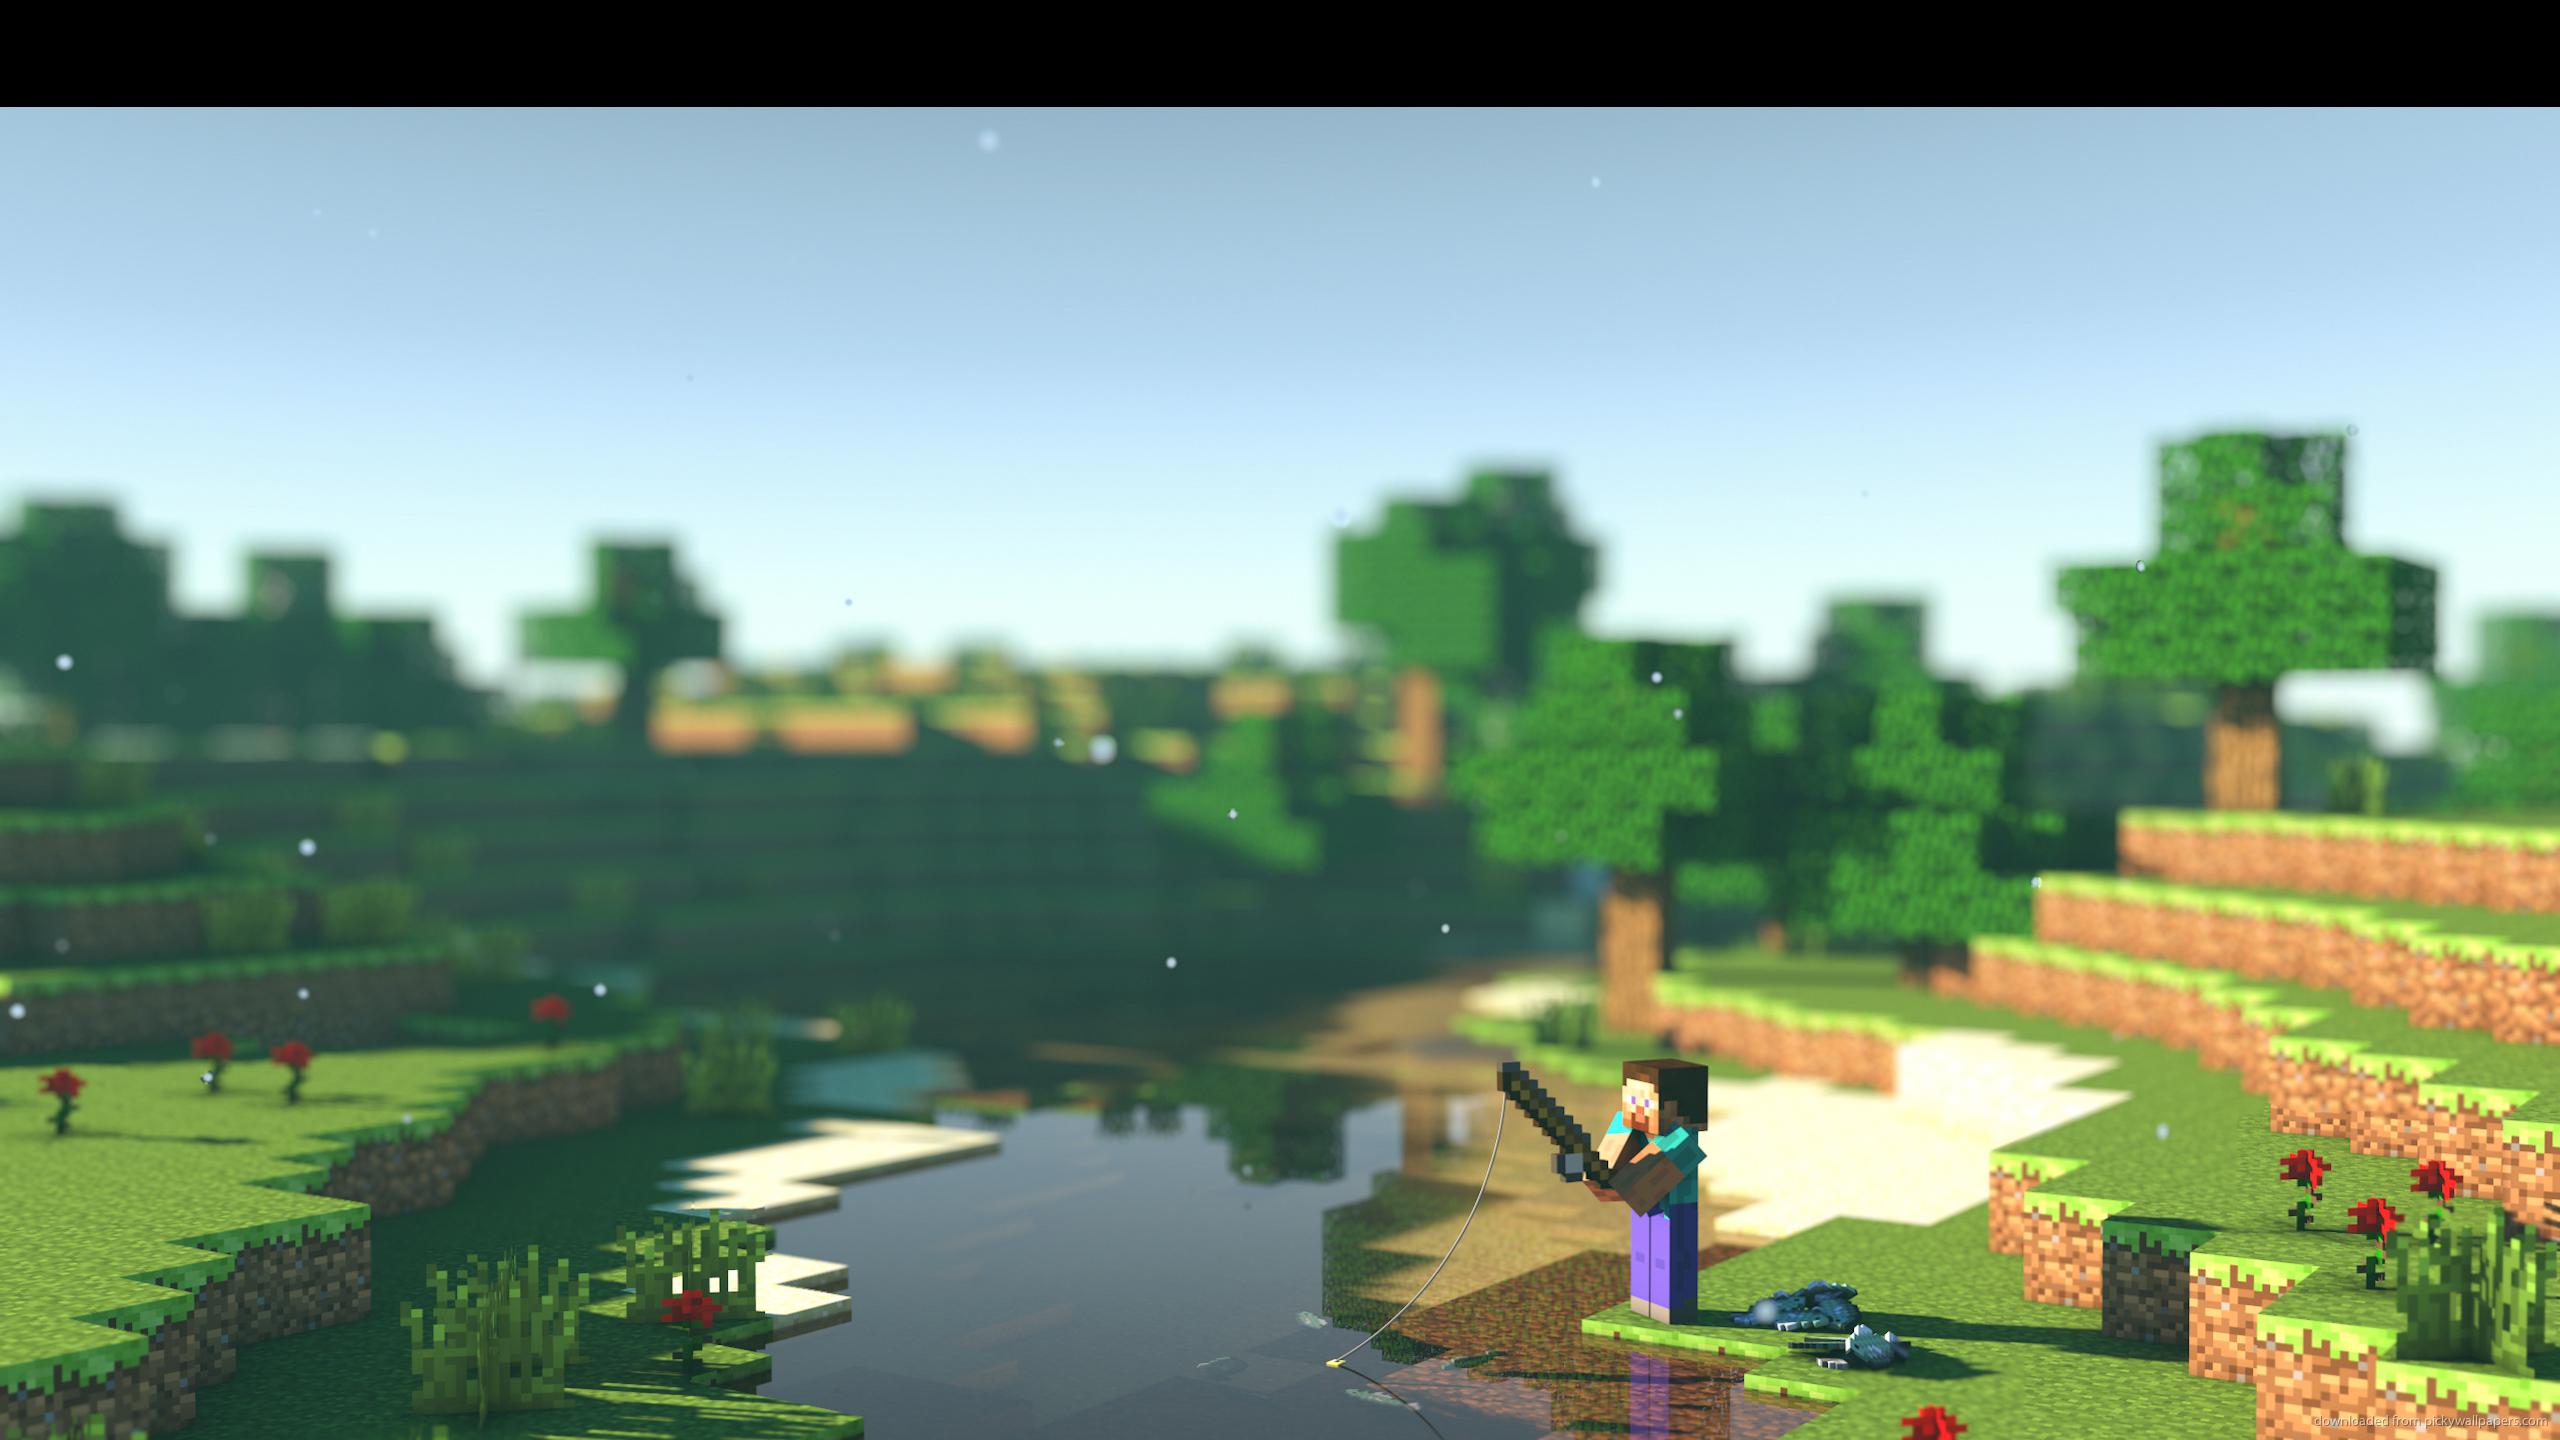 com2560x1440gamesminecraftminecraft fishing wallpaperdownload 2560x1440